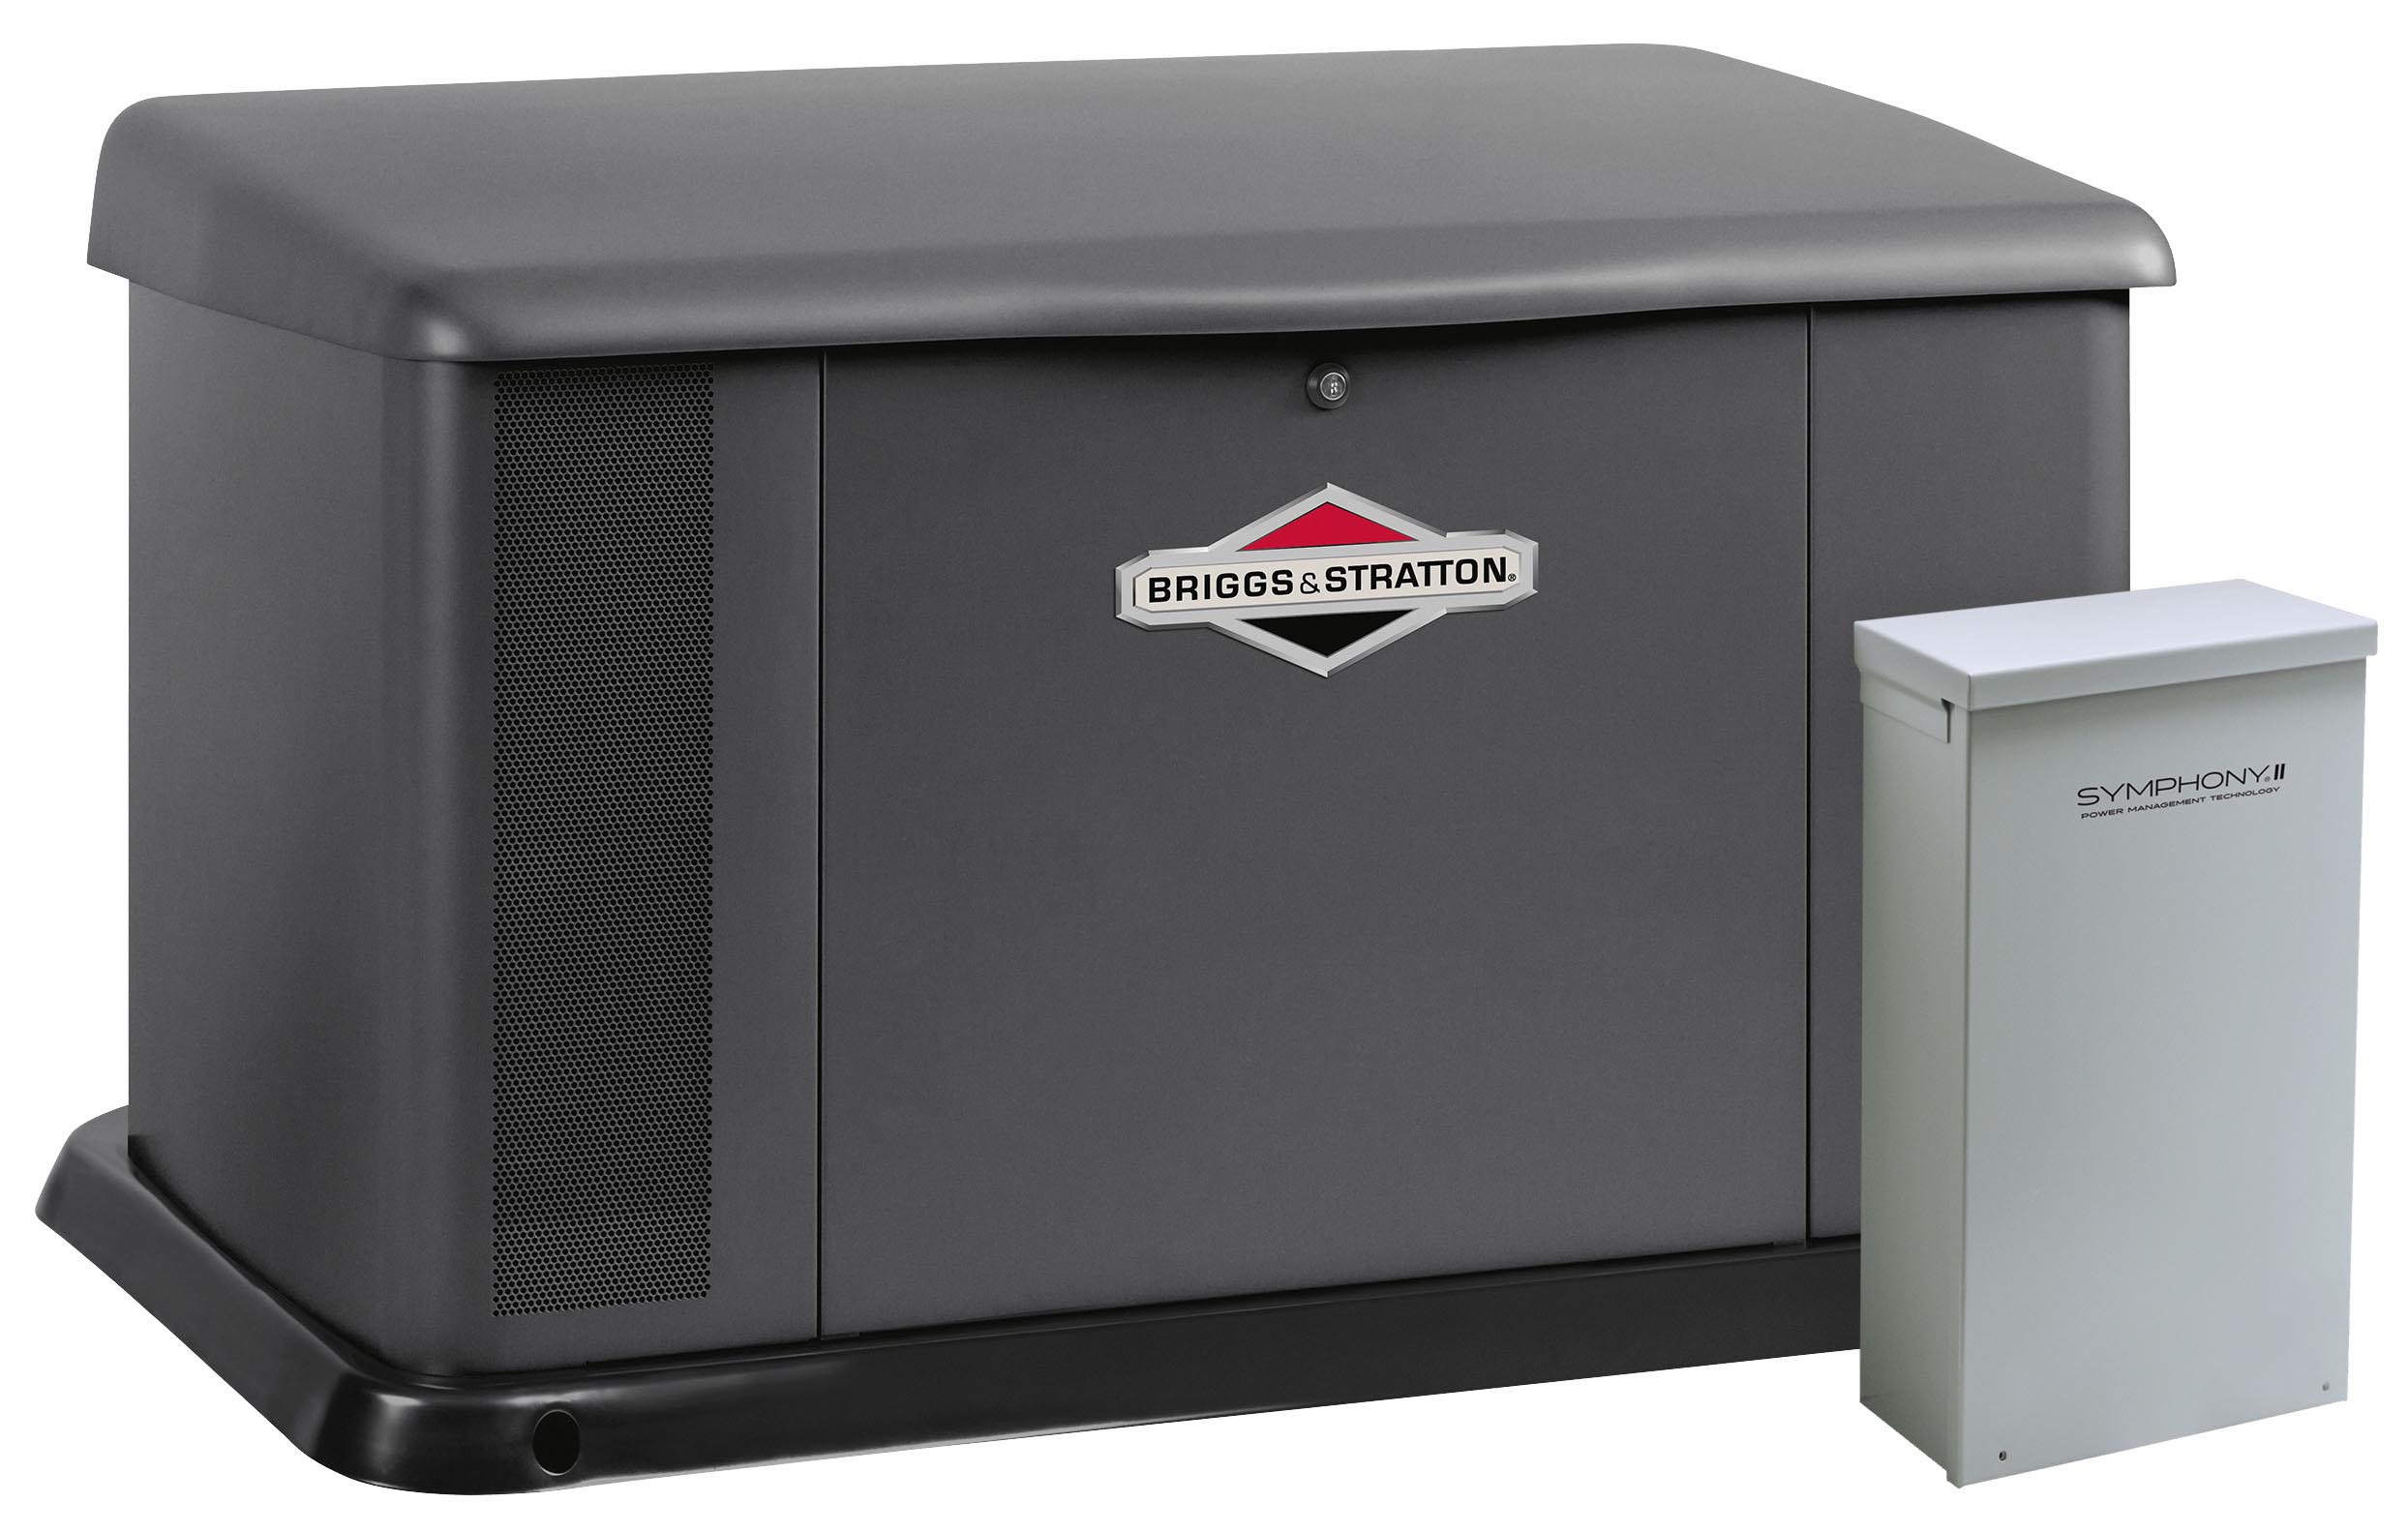 Briggs & Stratton Home Standby Generator - 20 kW, 100 Amp